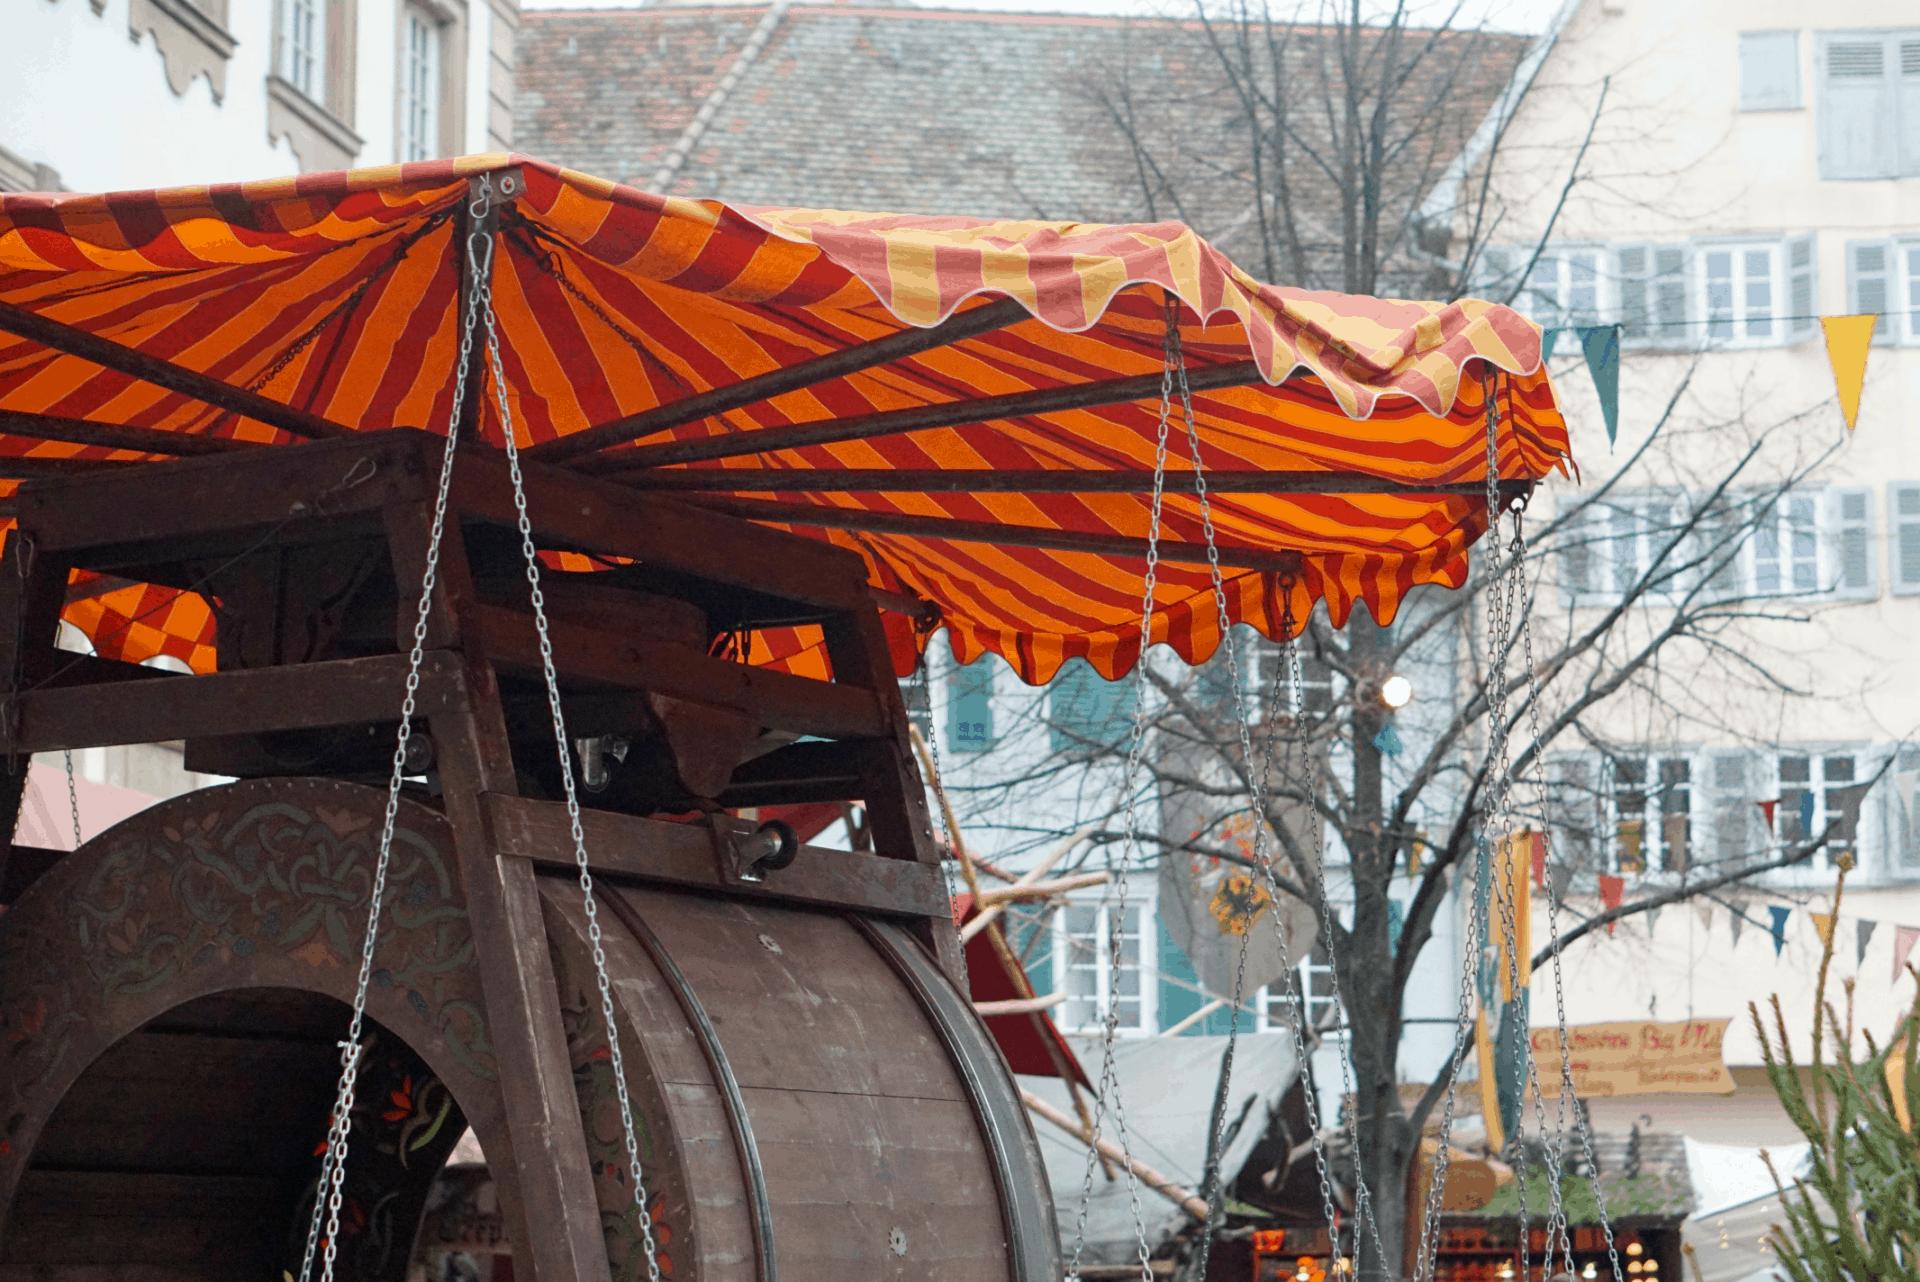 Esslingen medieval Christmas Markets In Stuttgart, Germany www.extraordinarychaos.com